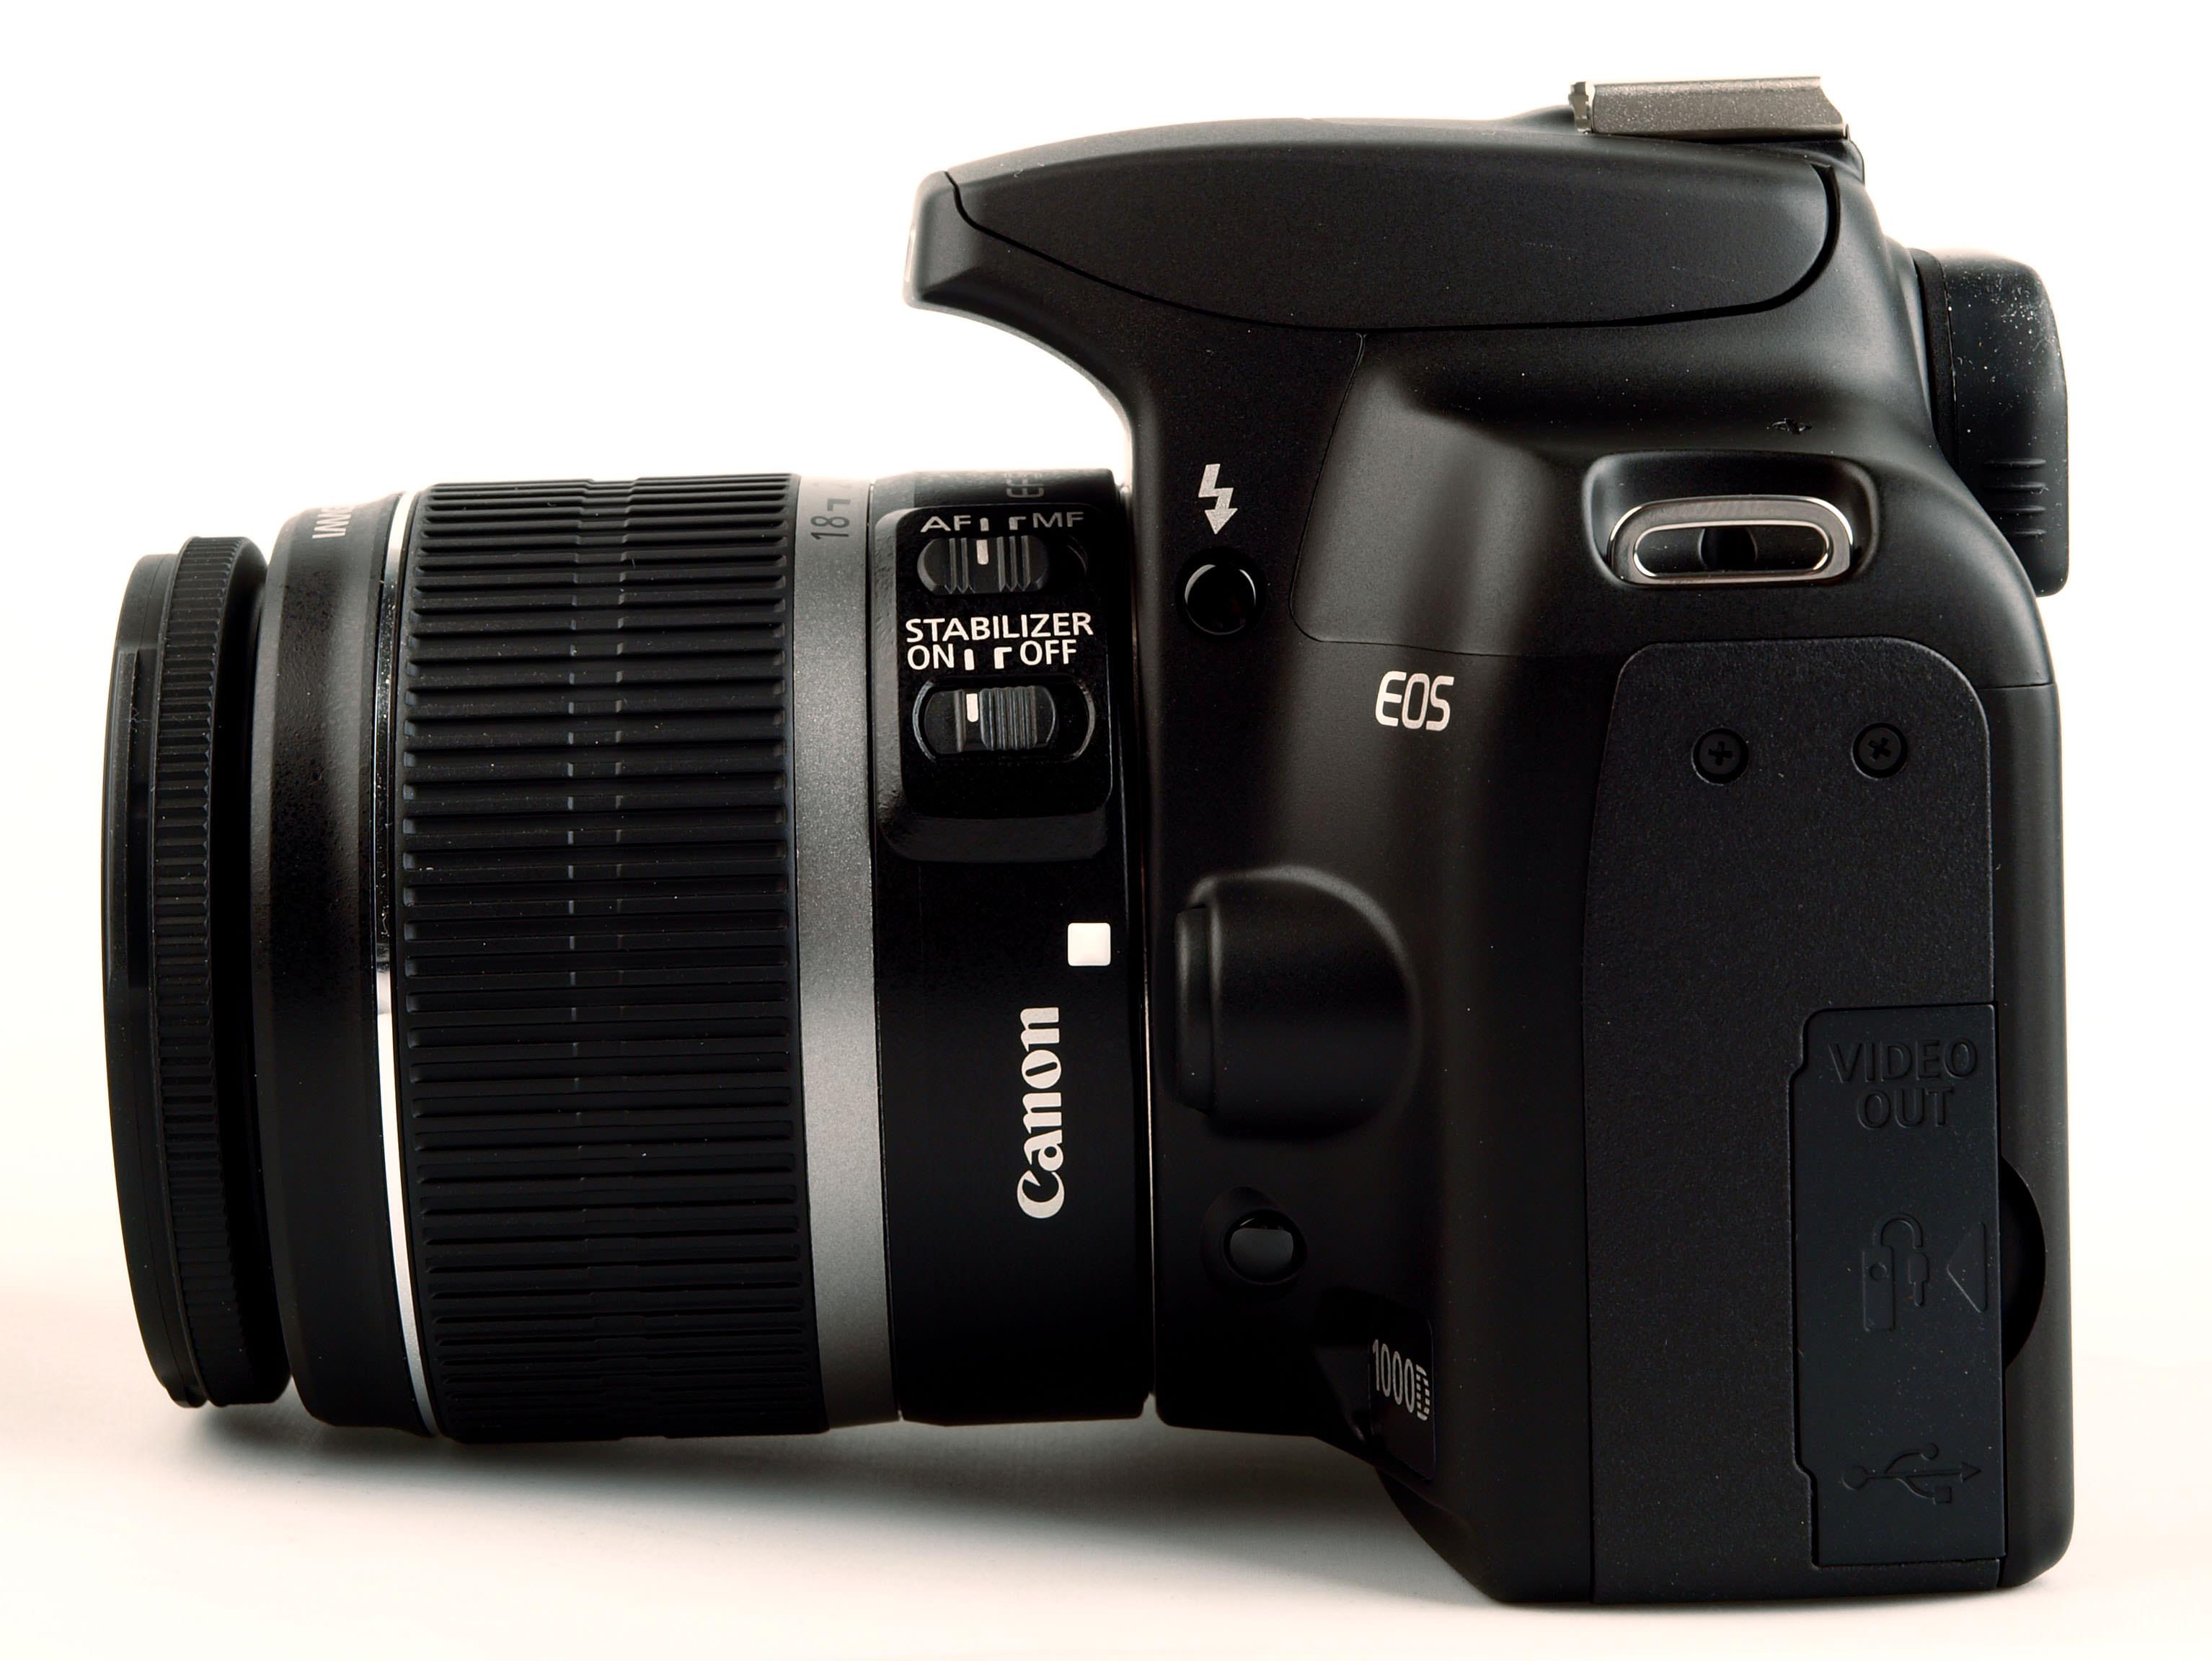 Camera Canon 1000d Dslr Camera Price canon eos 1000d digital slr review 1000d